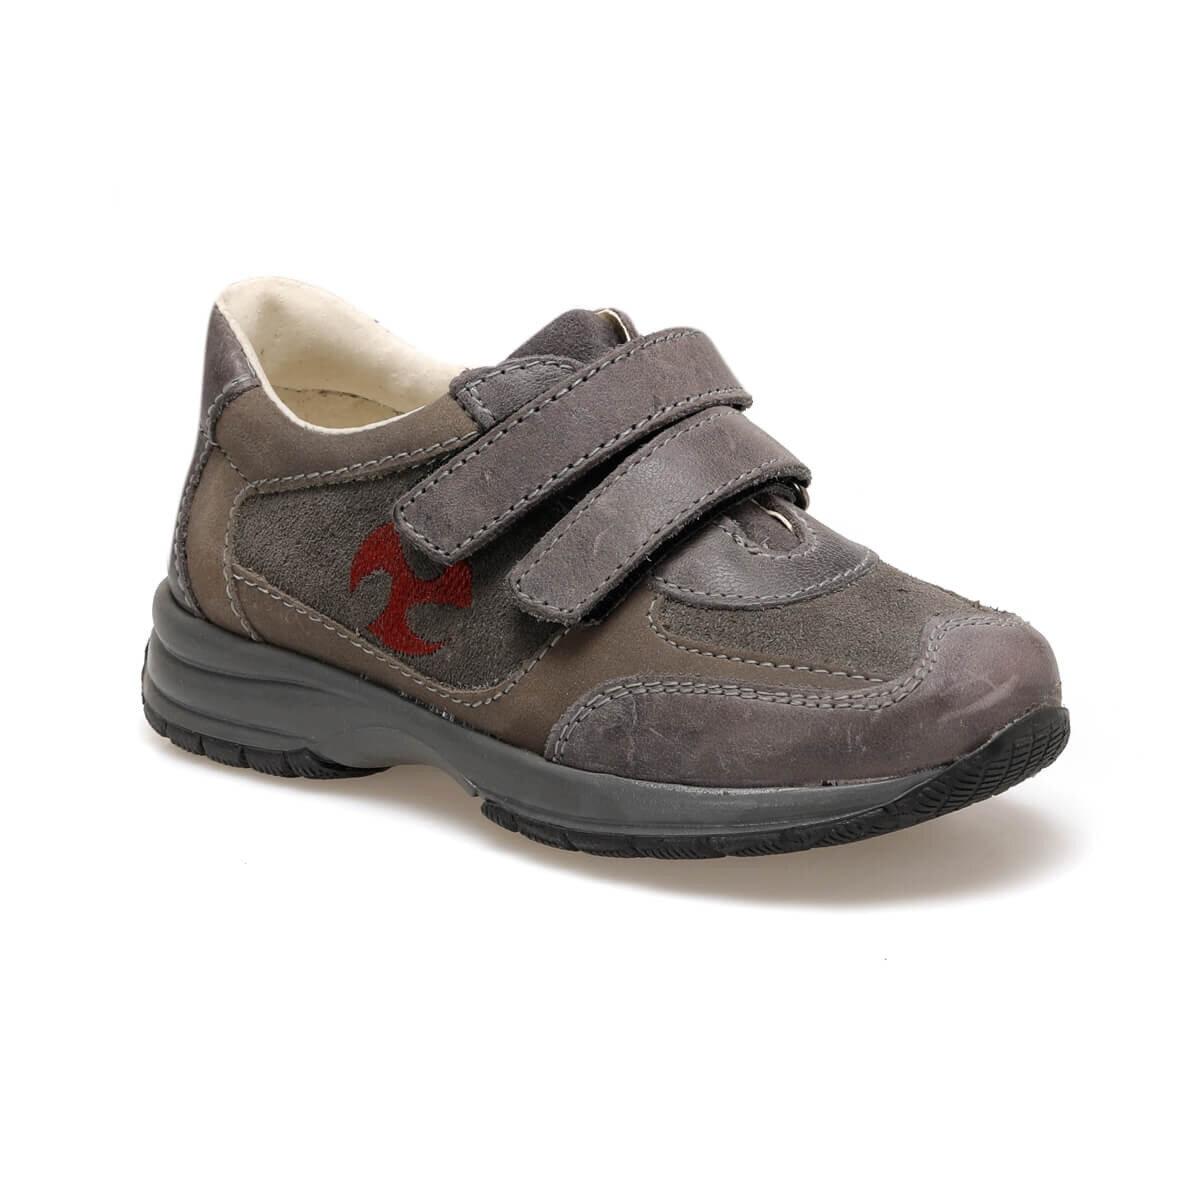 FLO 2627 D31 Smoked Male Child Shoes Kifidis